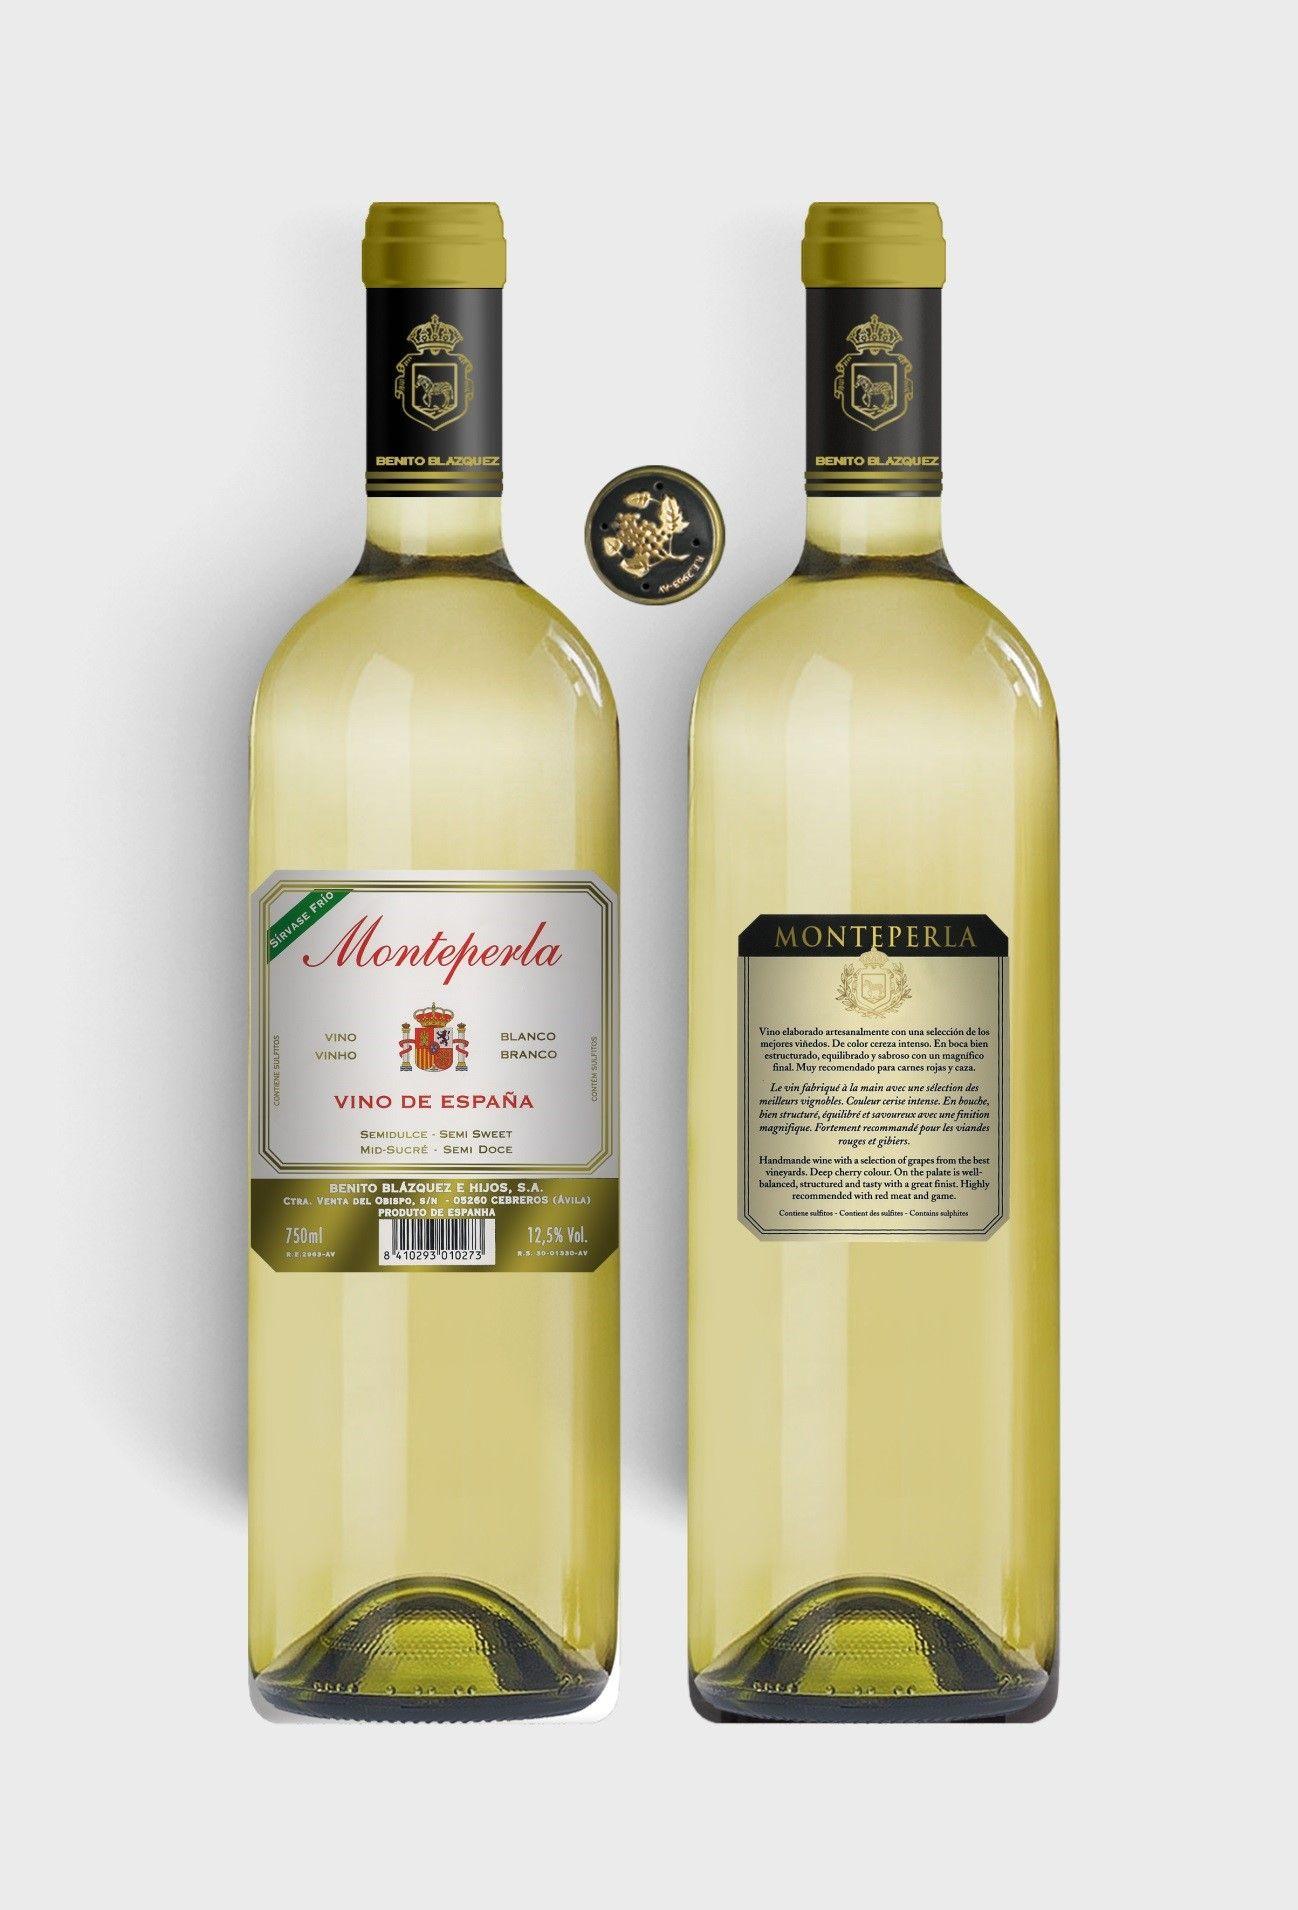 Benito Blázquez - Botella de Vino Blanco Monteperla